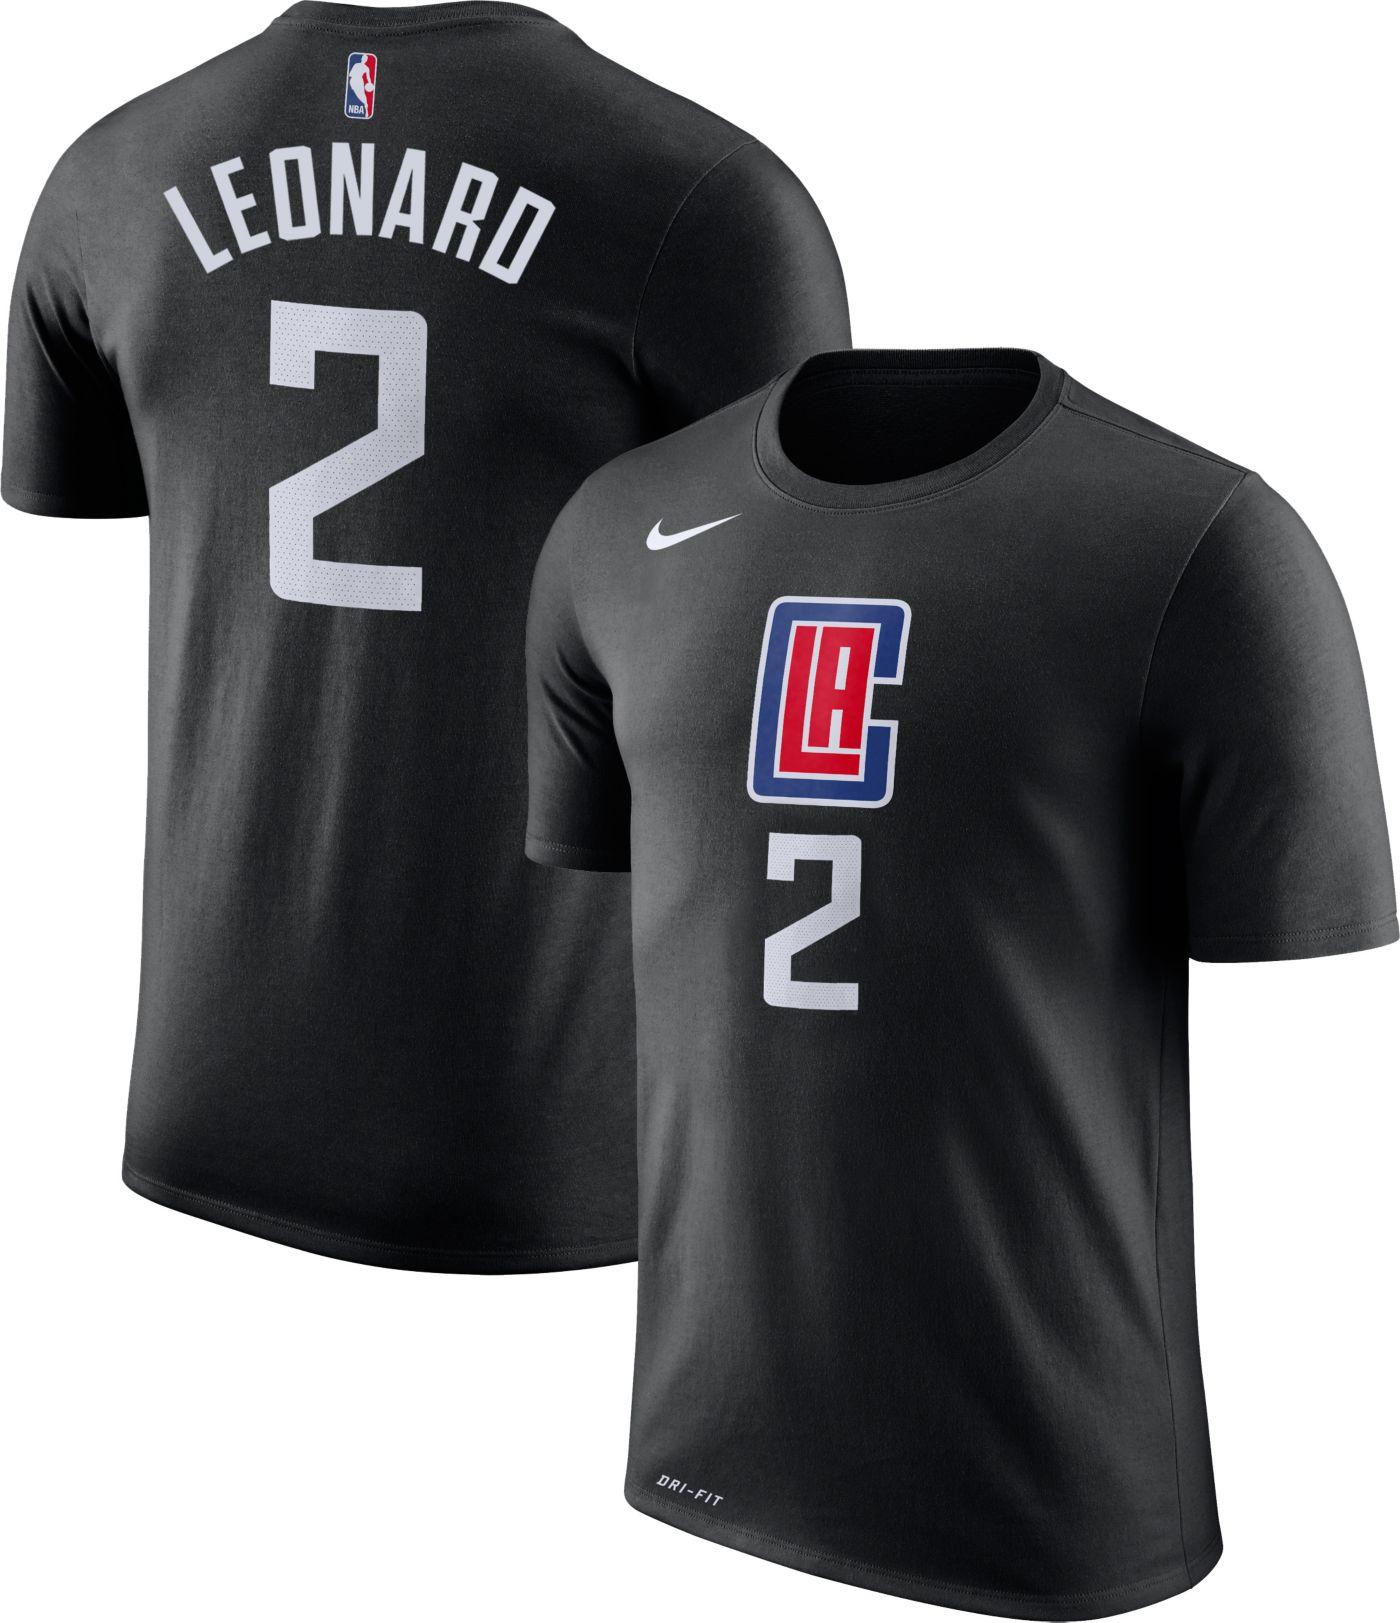 Nike Youth Los Angeles Clippers Kawhi Leonard #2 Dri-FIT Statement Black T-Shirt